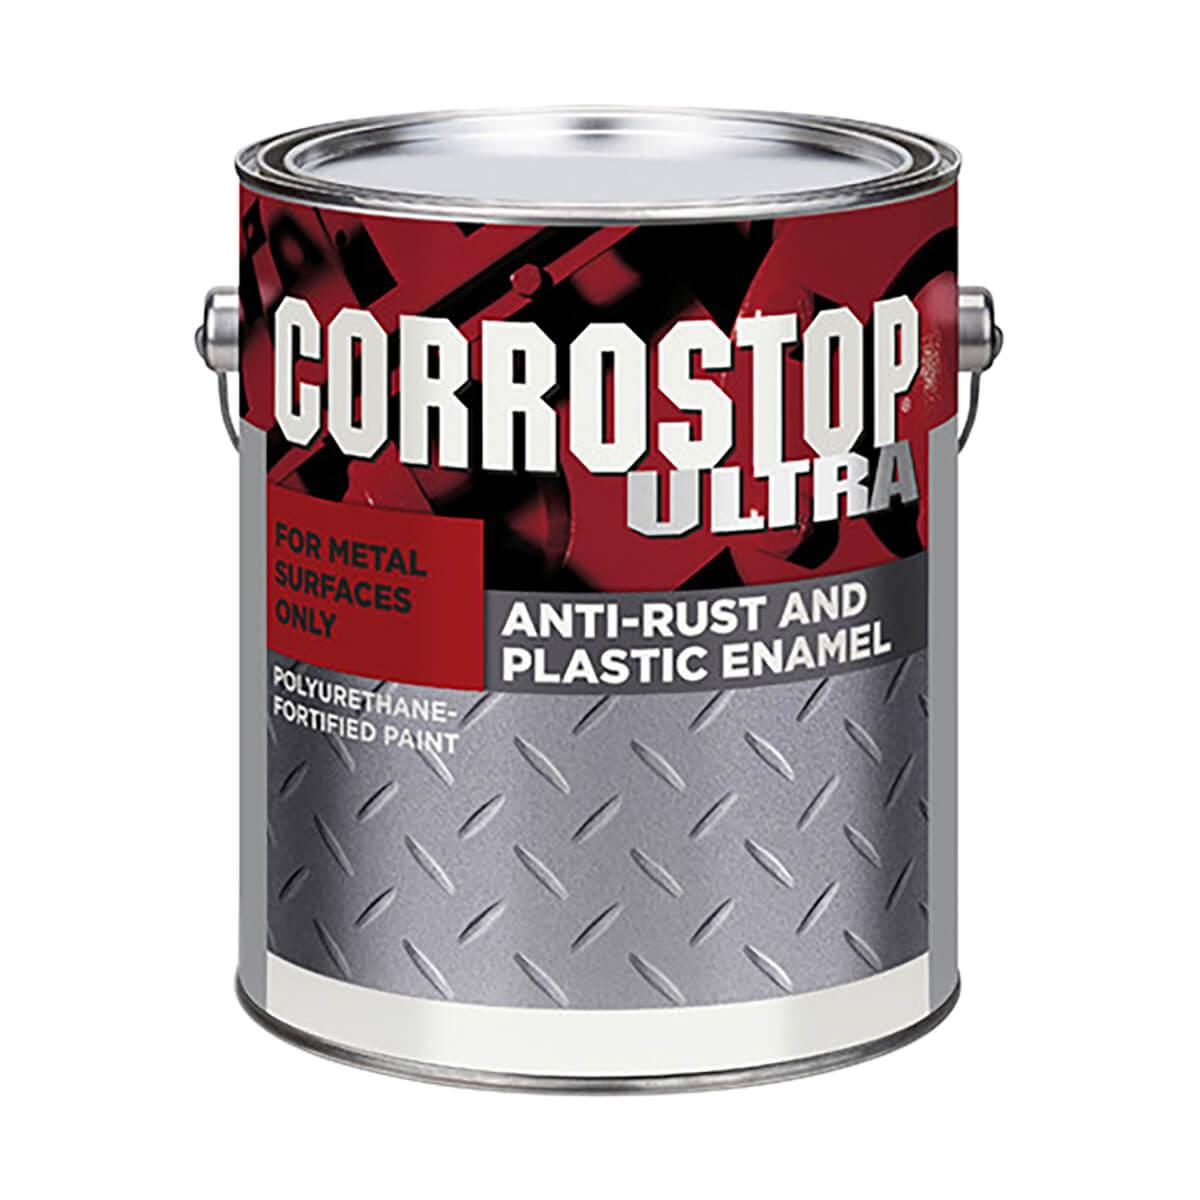 Corrostop - Anti-rust Alkyd Paint - Aluminum - 3.78 L